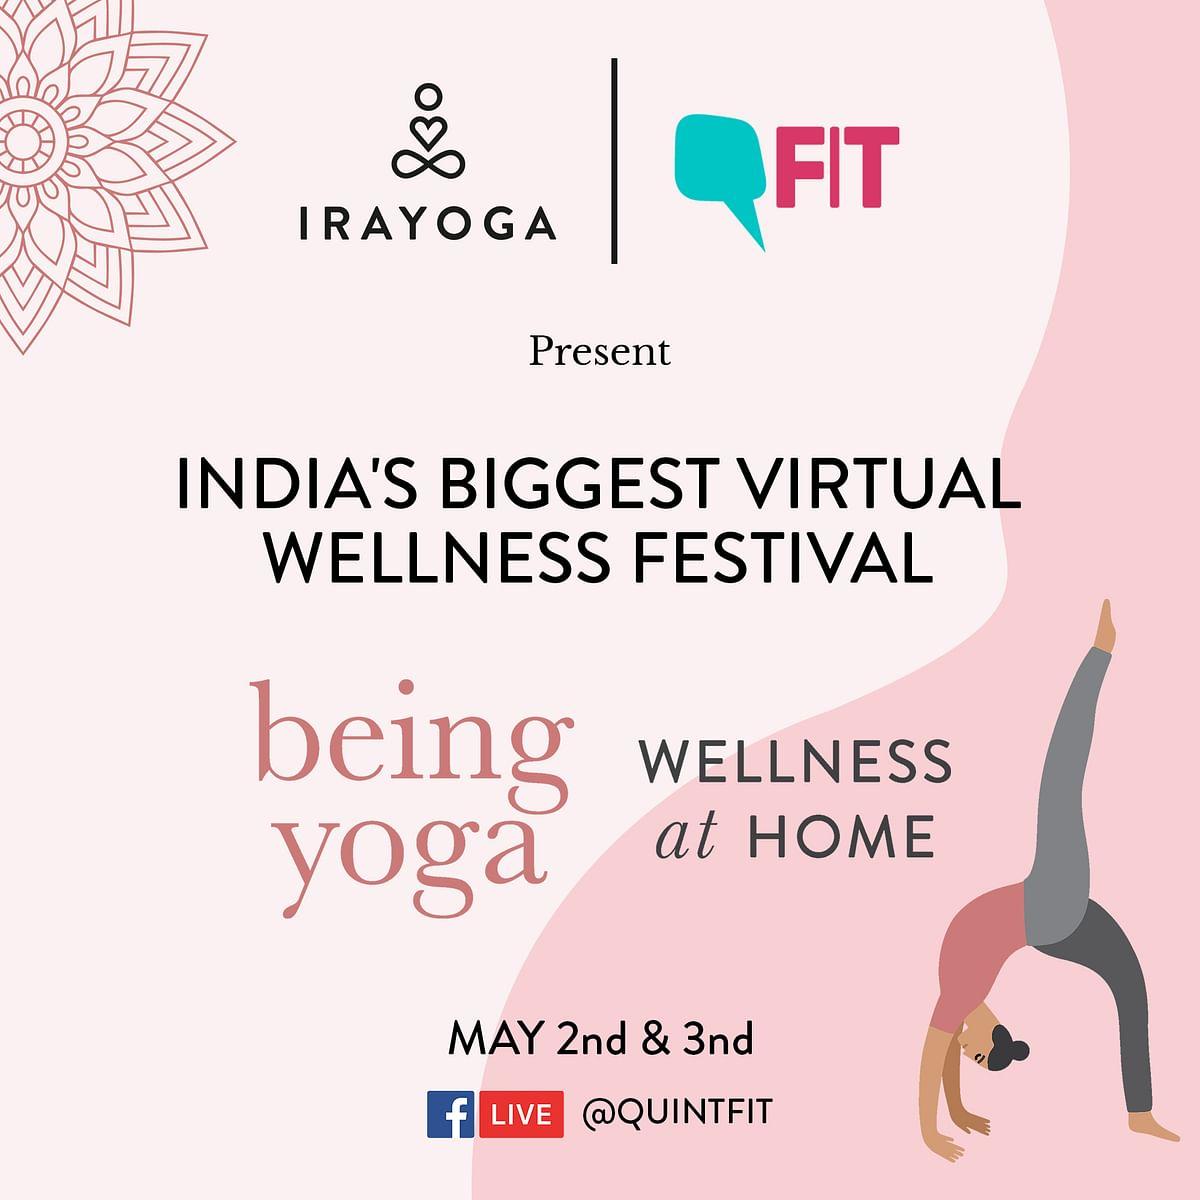 FIT & Ira Yoga Bring You India's Biggest Virtual Wellness Festival